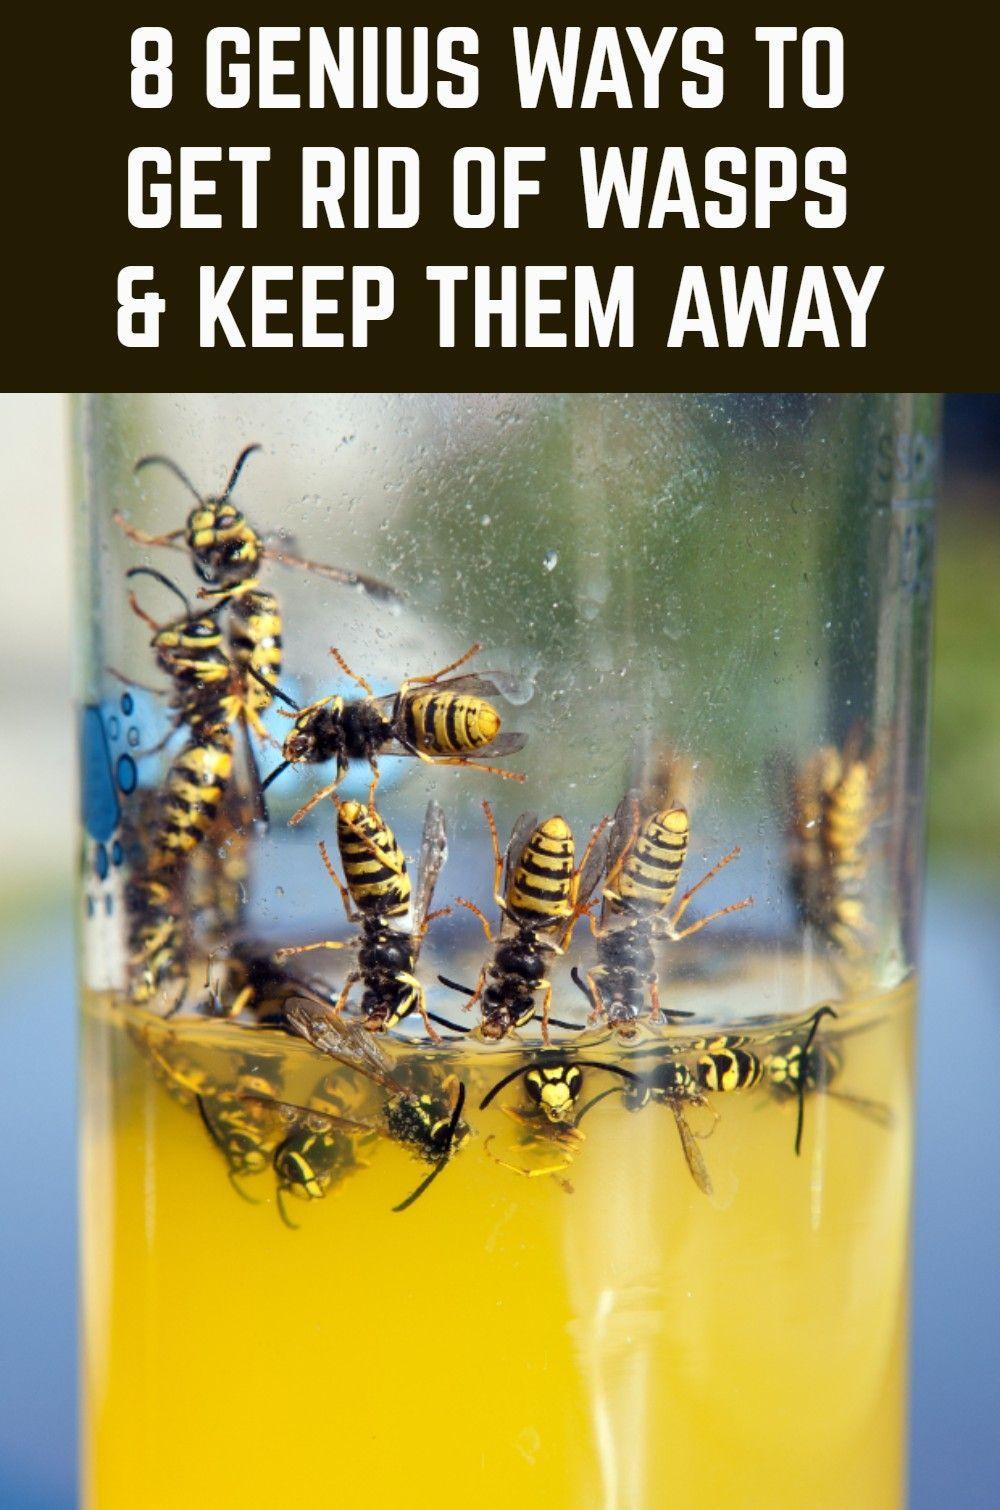 8 Genius Ways To Get Rid Of Wasps & Keep Them Away Get